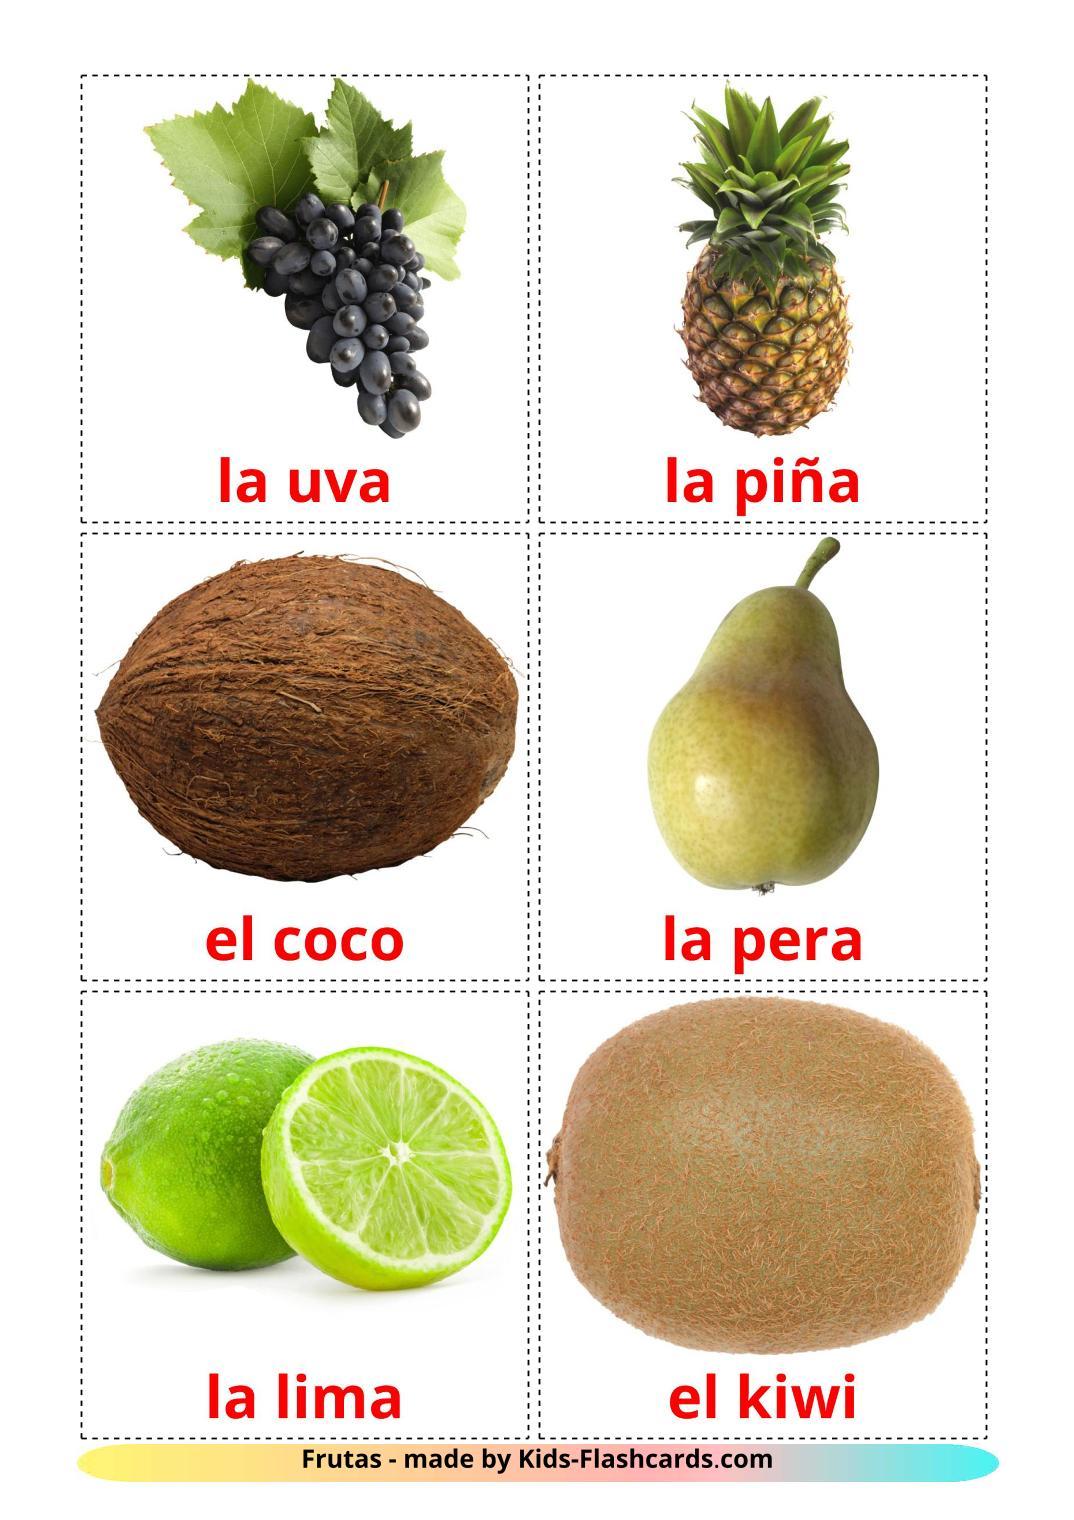 Fruits - 20 Free Printable spanish Flashcards